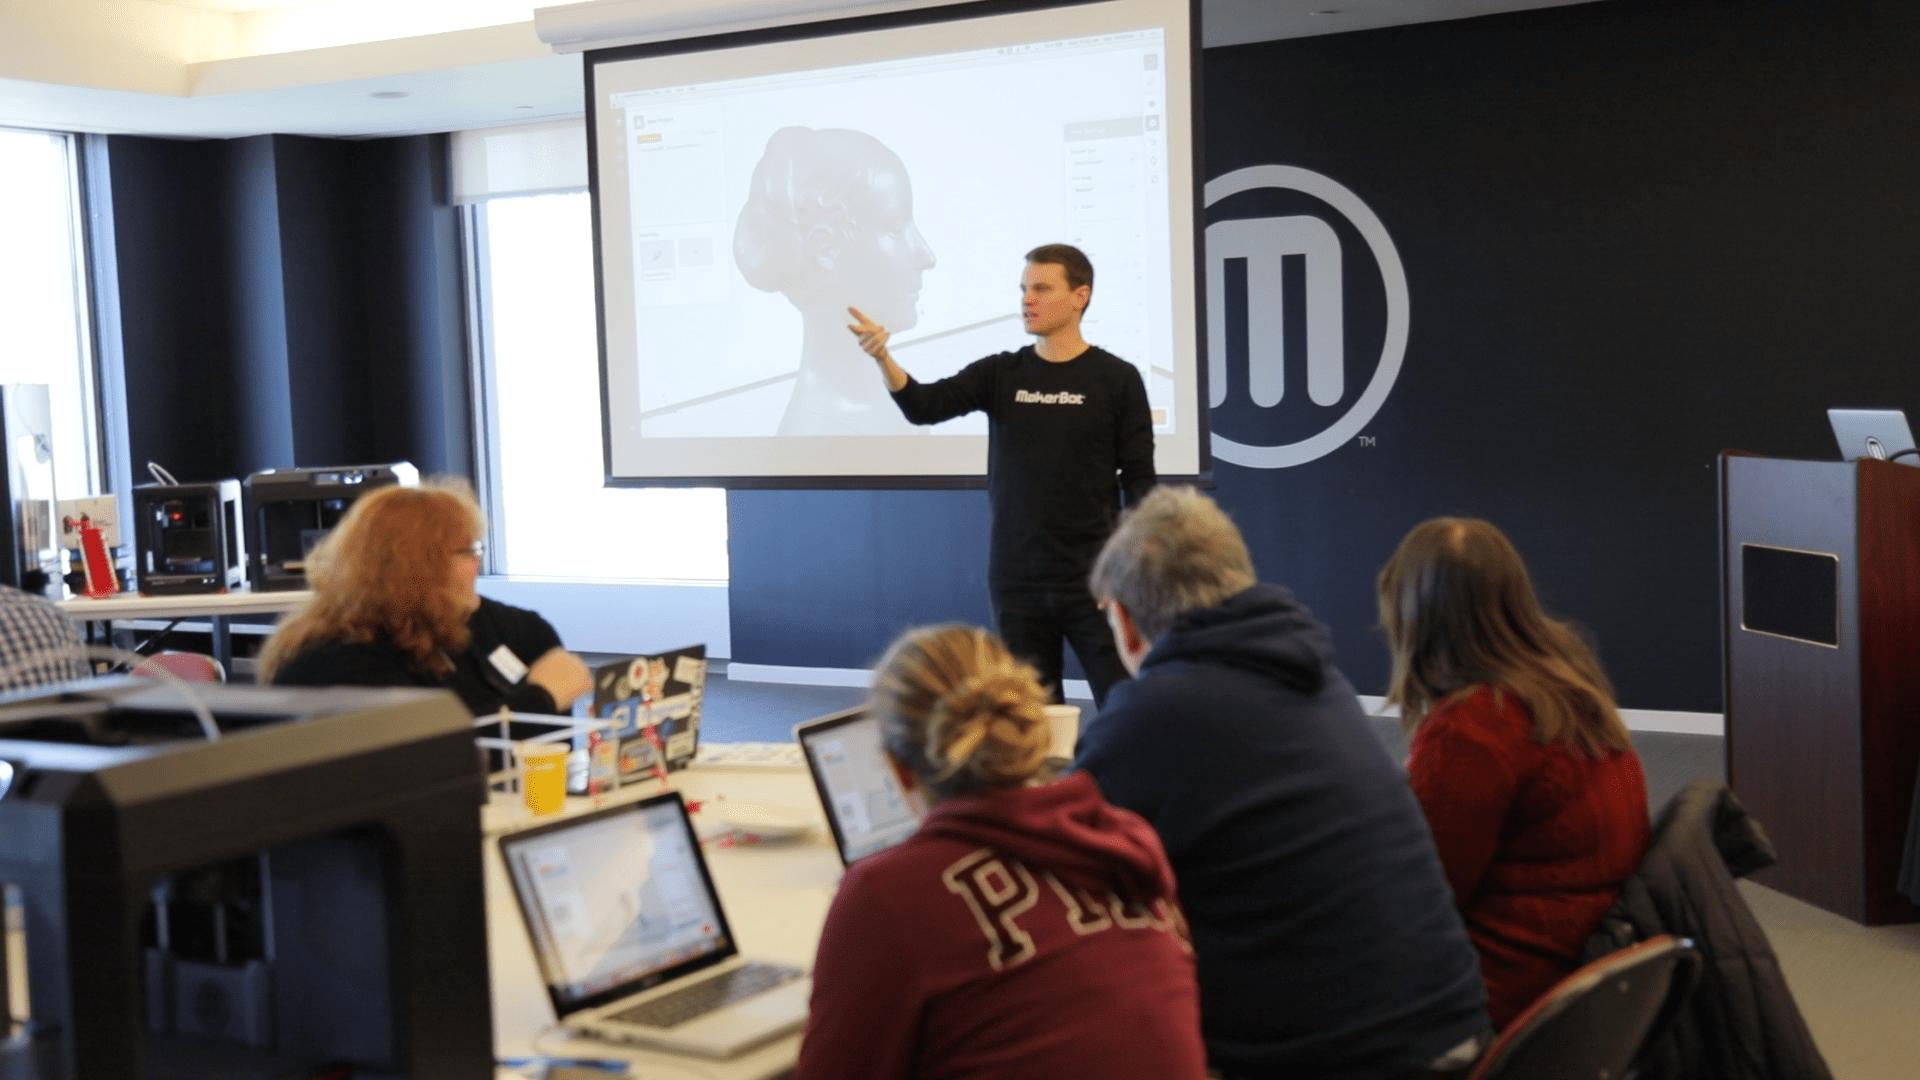 MakerBot Launches New Educator Certification Program | Make: